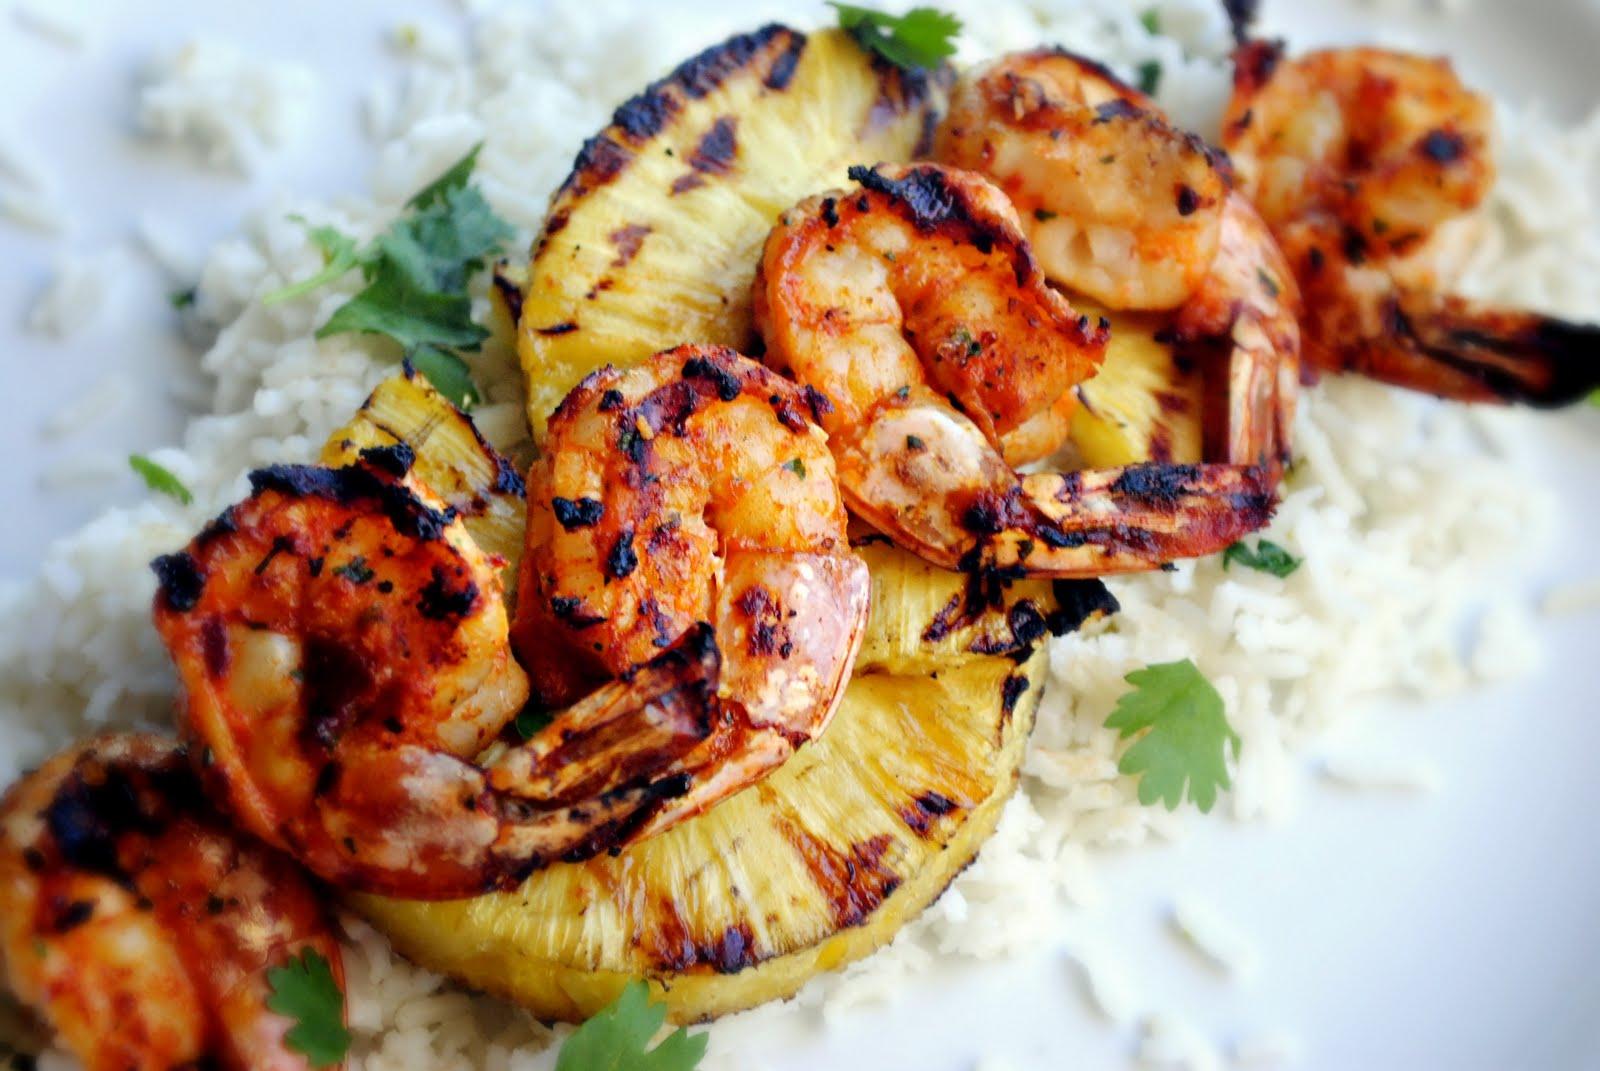 8 Hottest Restaurants In Key West